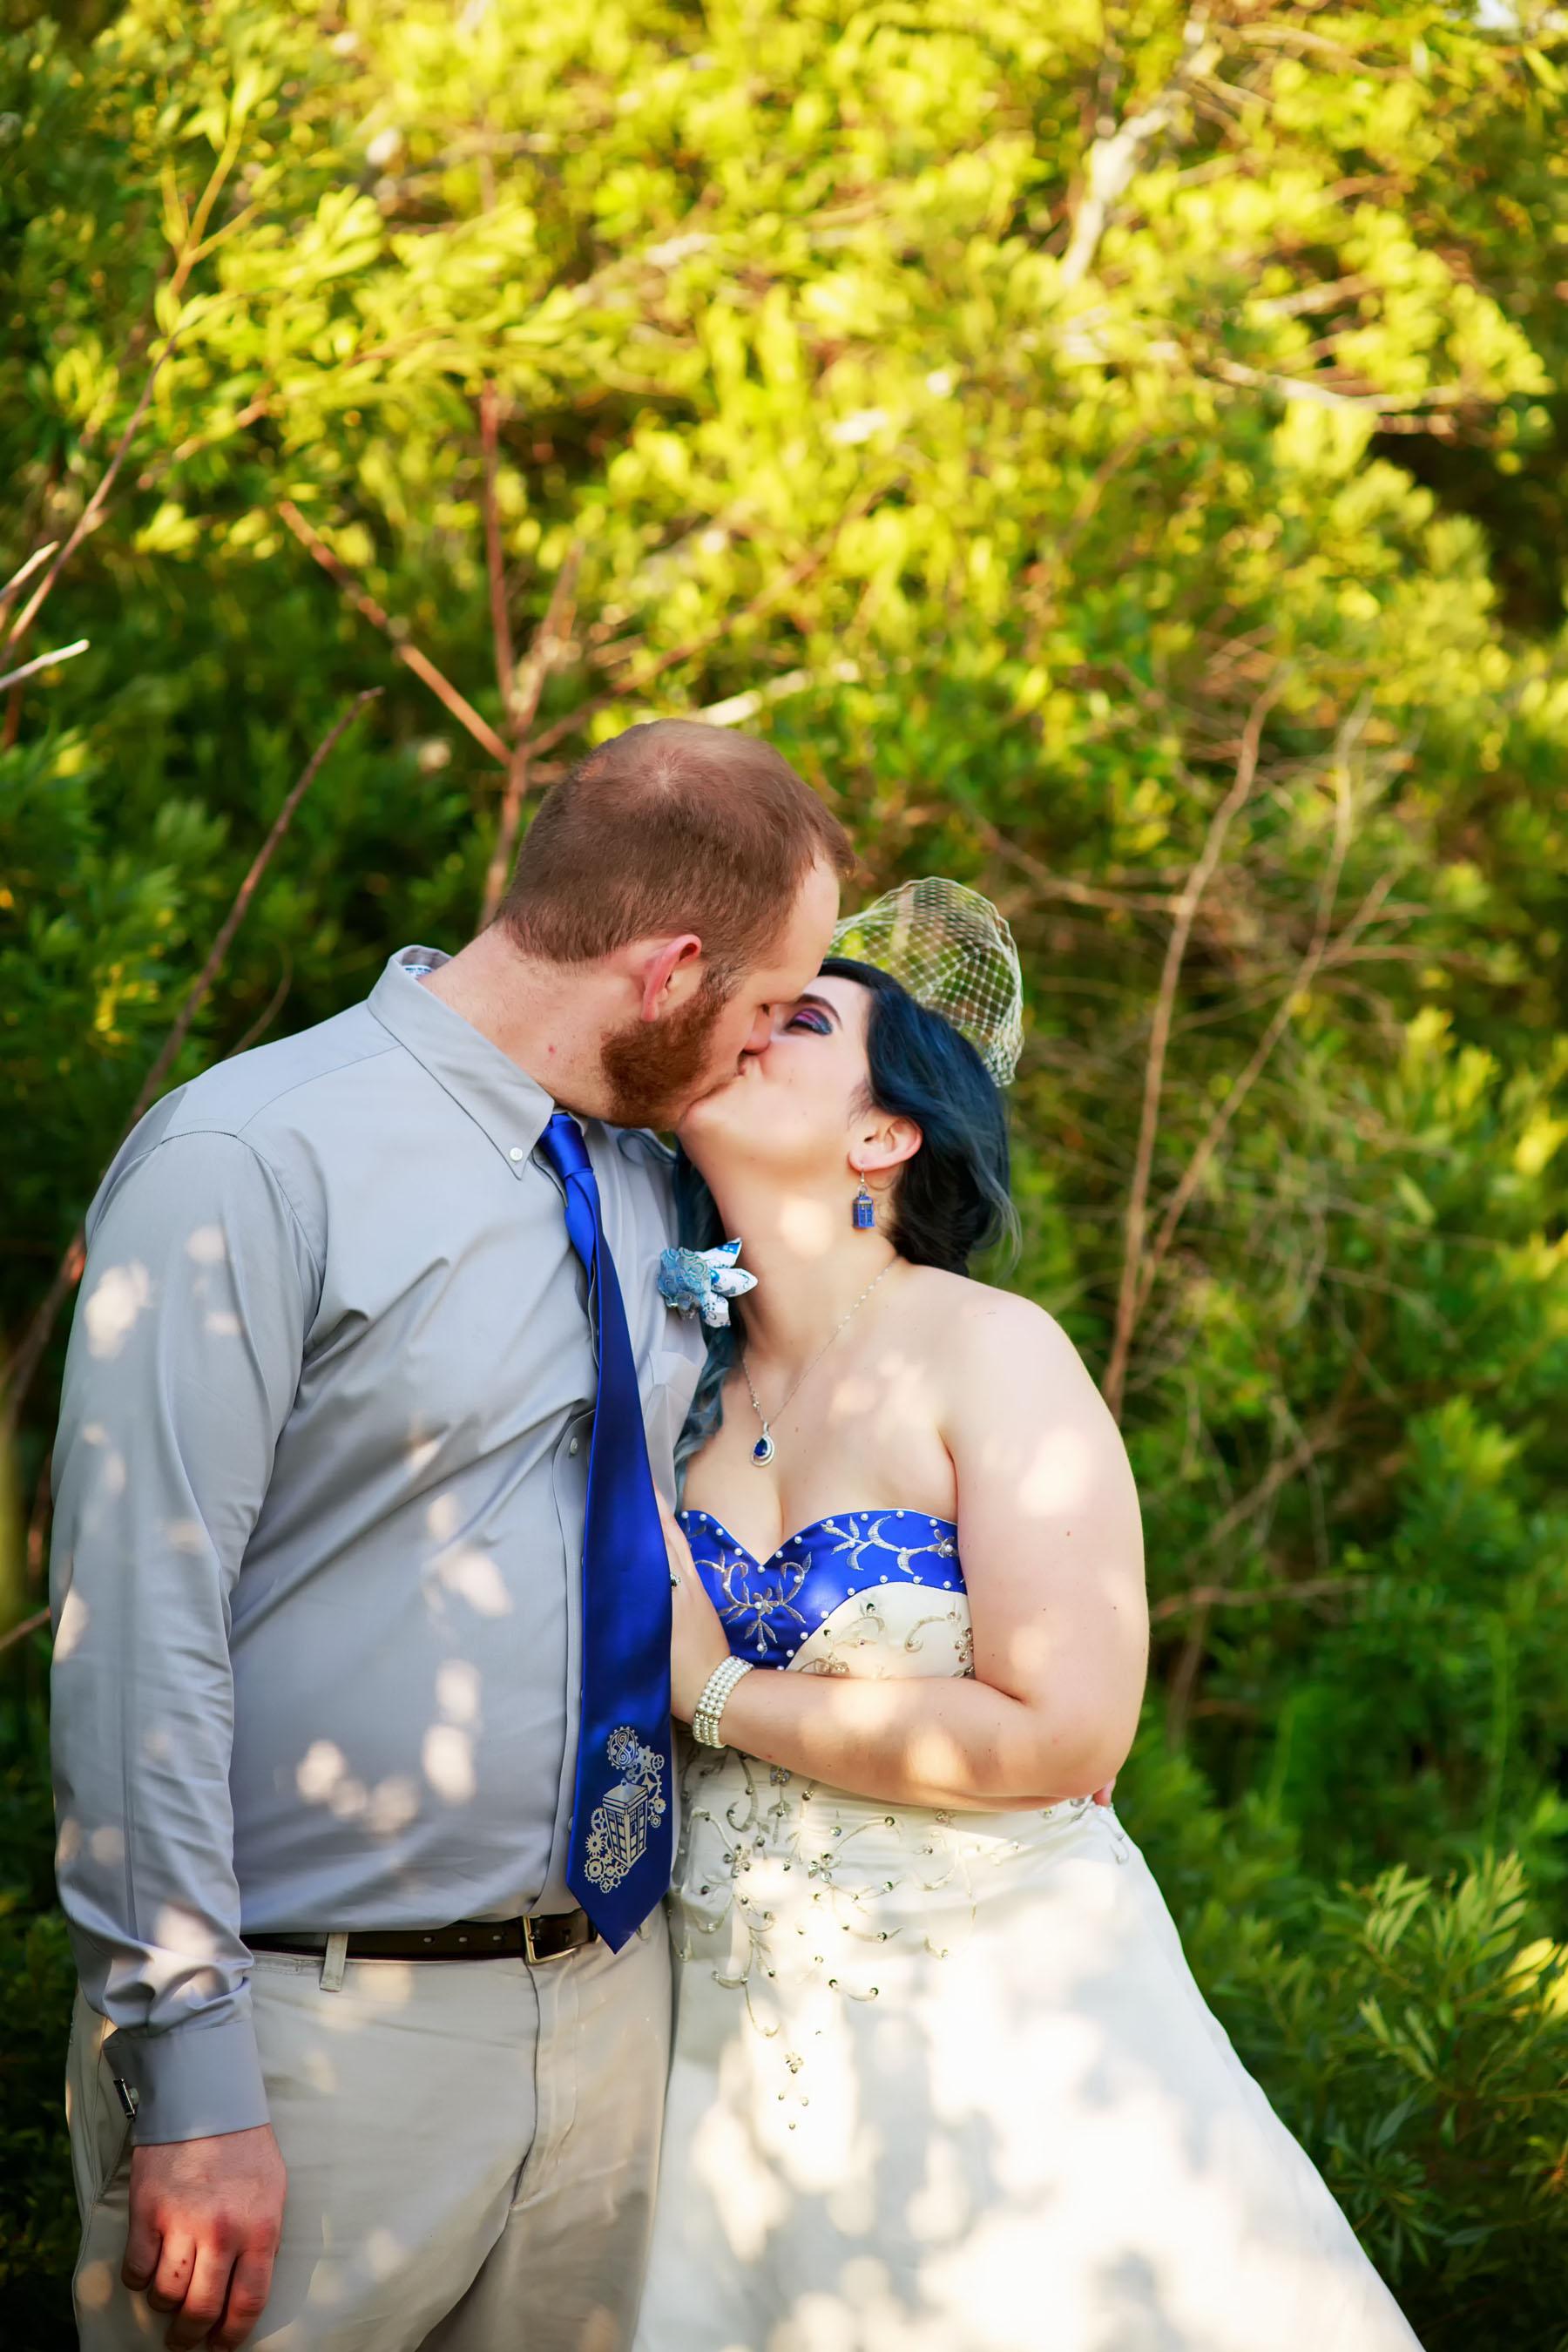 NC_Wedding_Photographer_Tiffany_Abruzzo_Photography_8.jpg